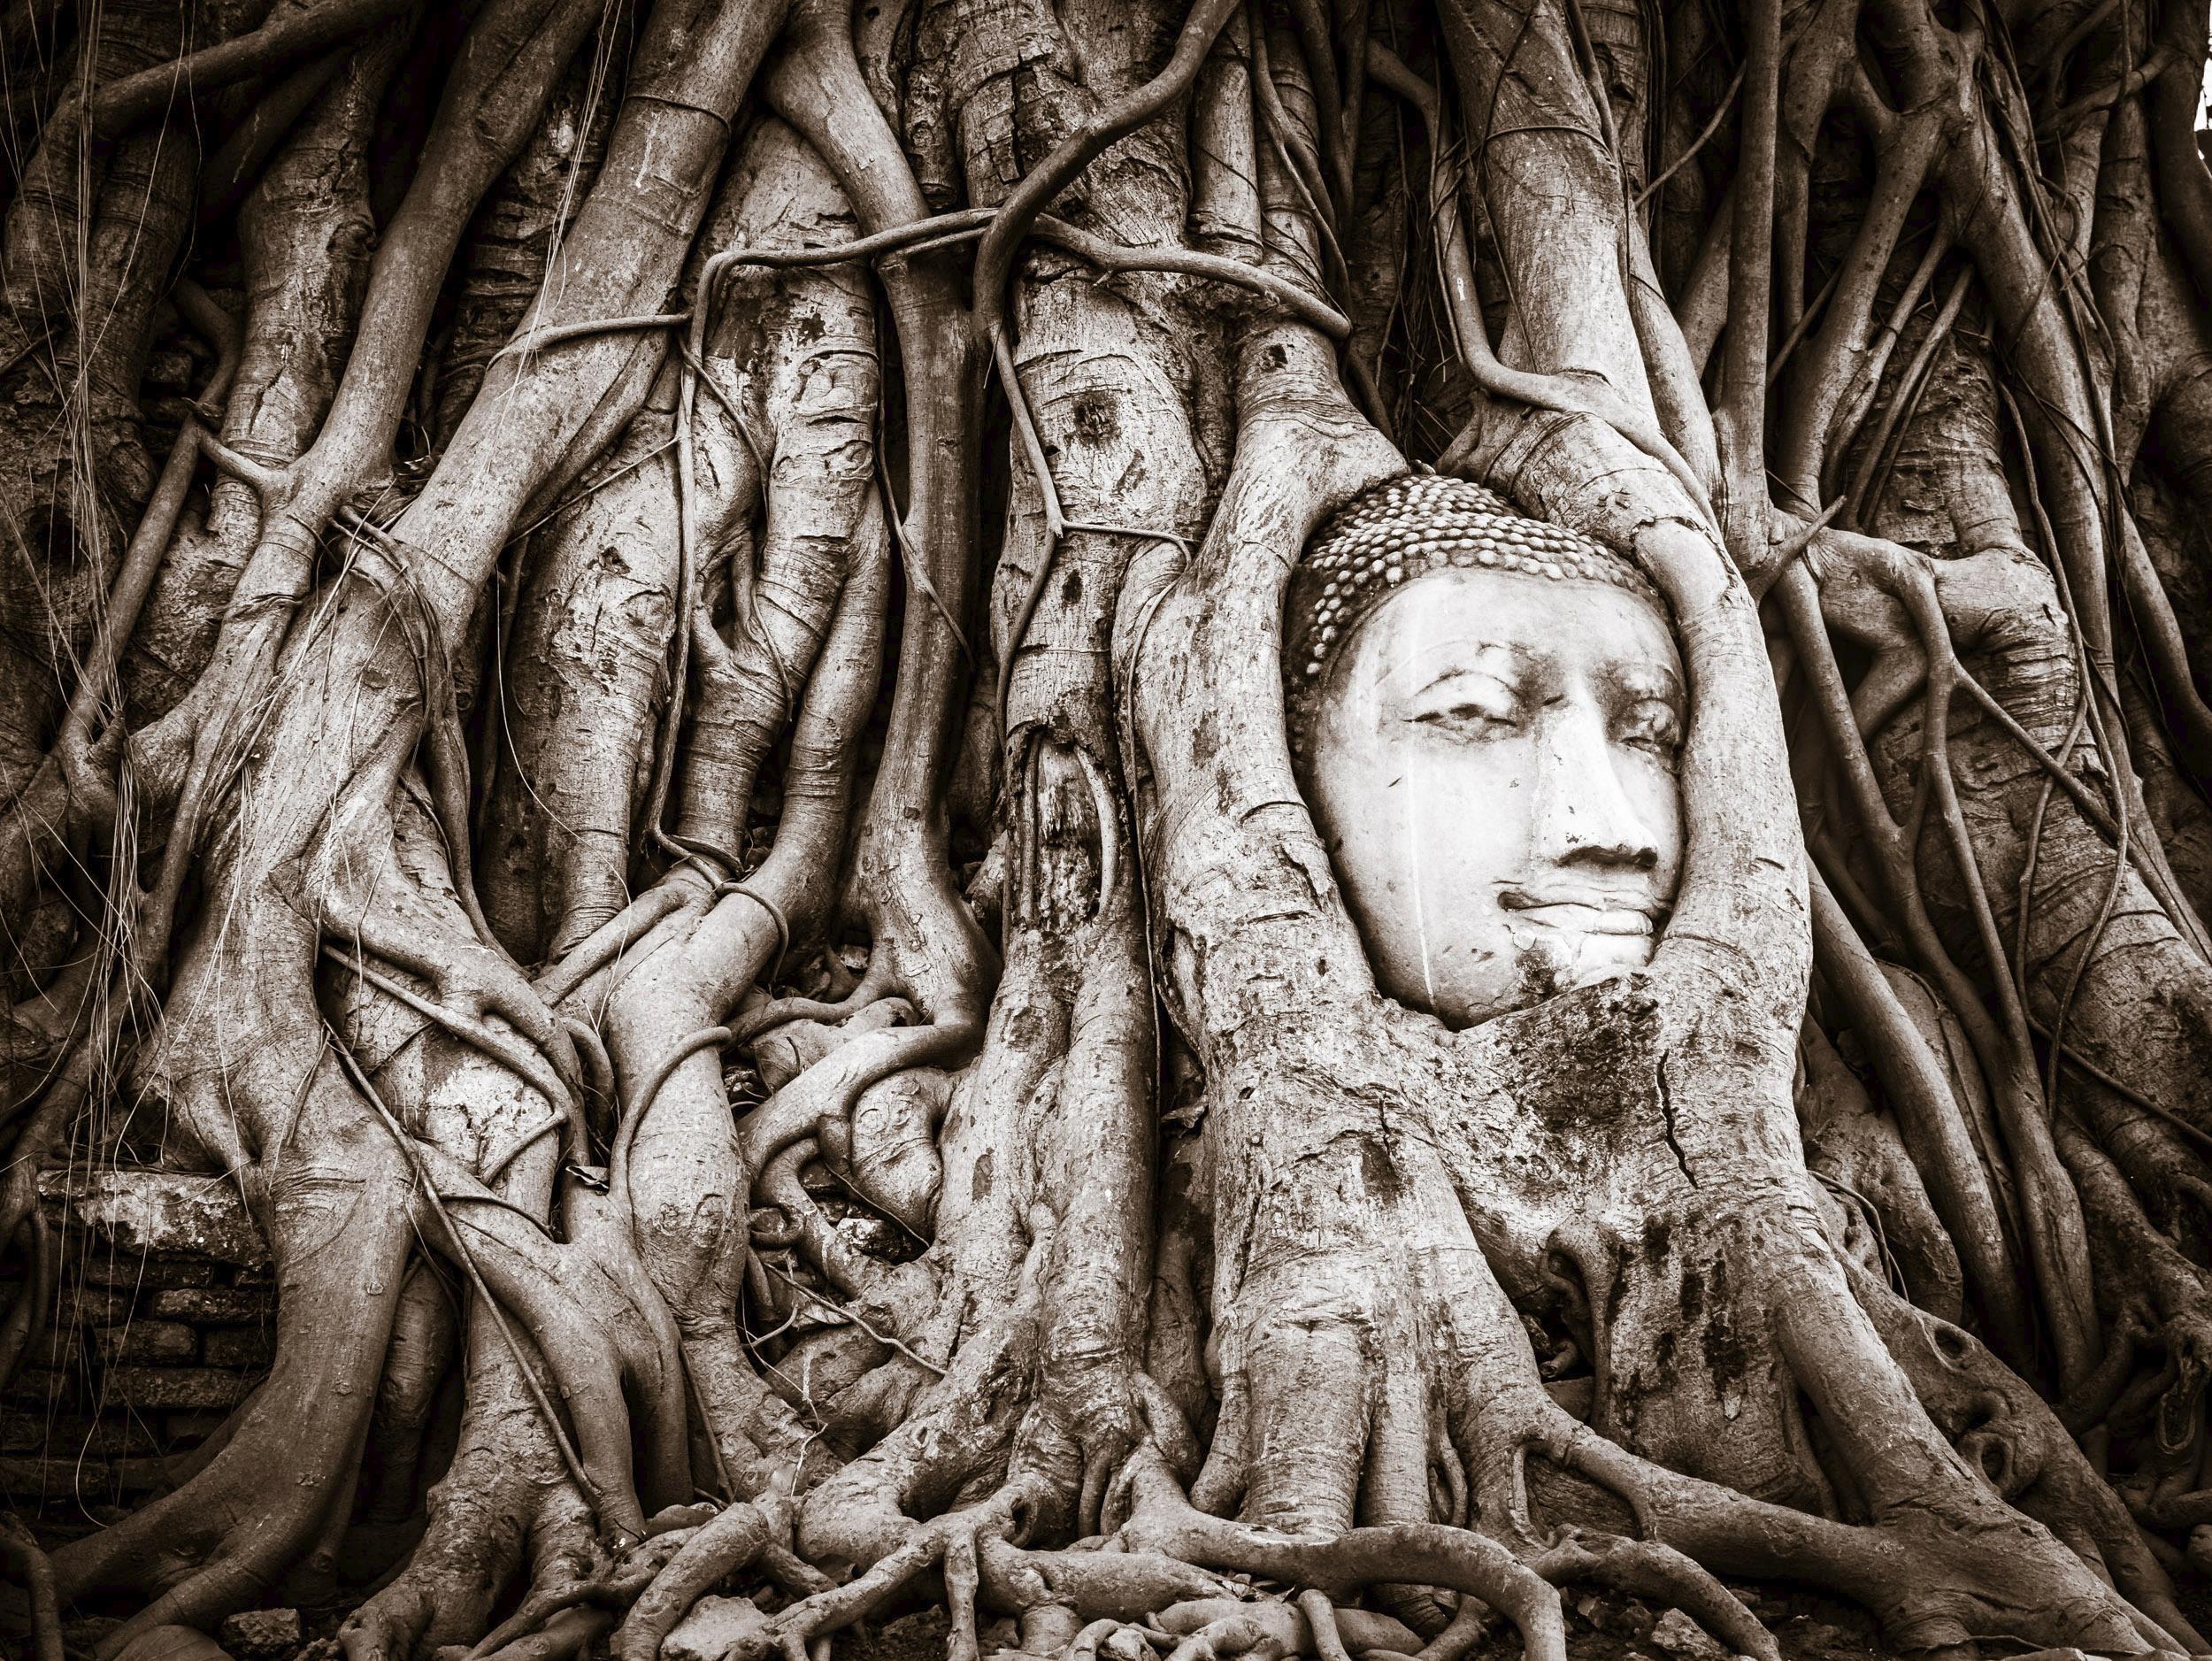 Ayuttaya Lost Buddhist Kingdom - travischau   ello